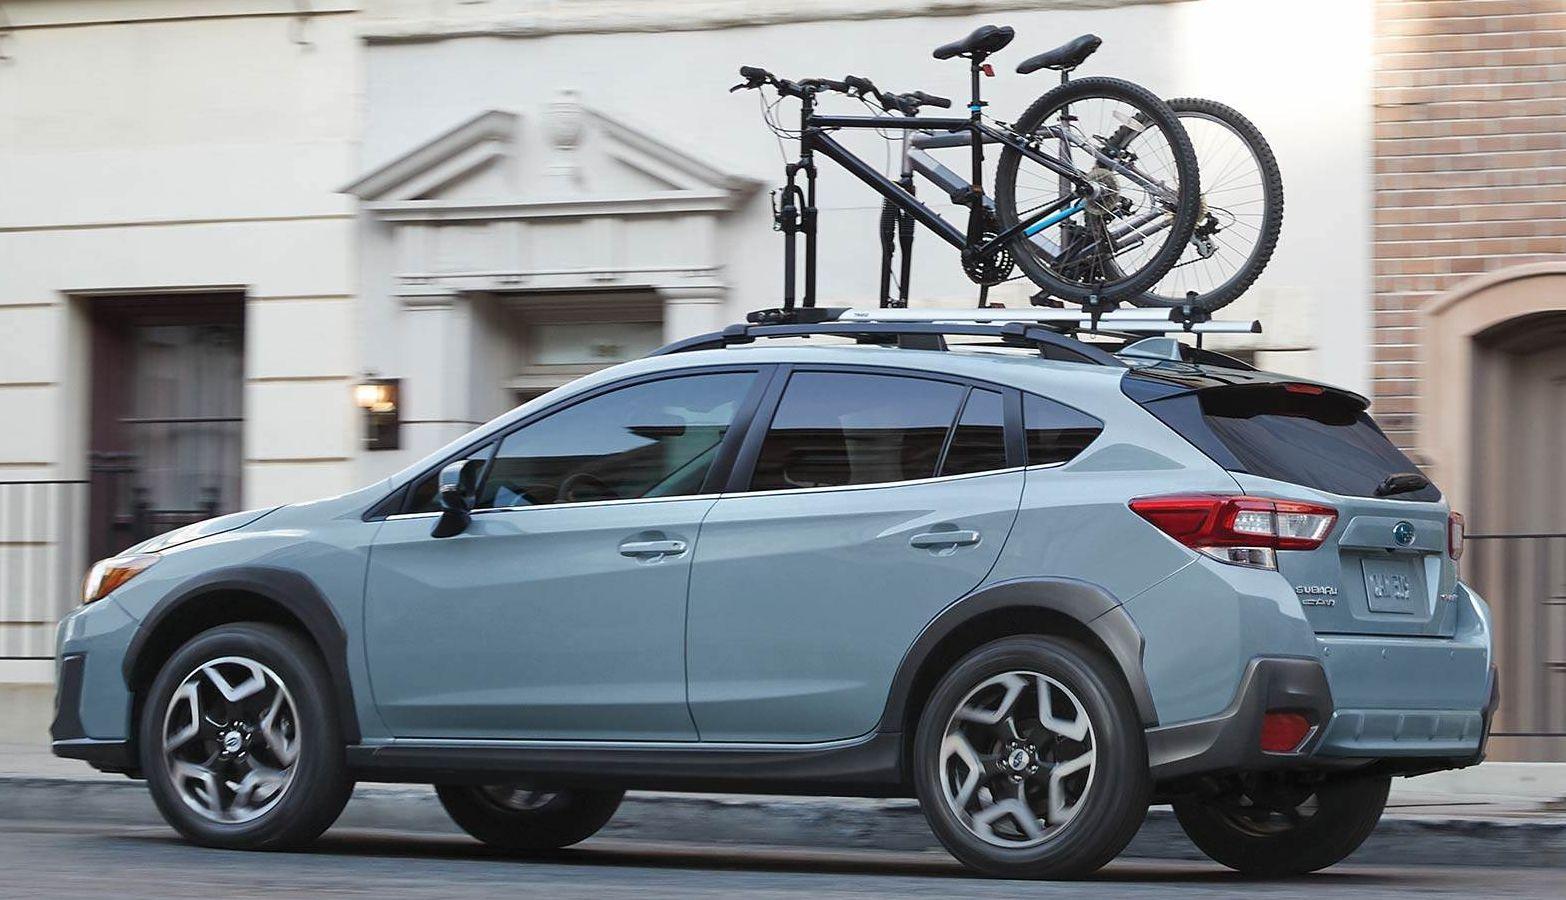 2018 subaru crosstrek financing near kingston ny rc lacy for Subaru motors finance online payment